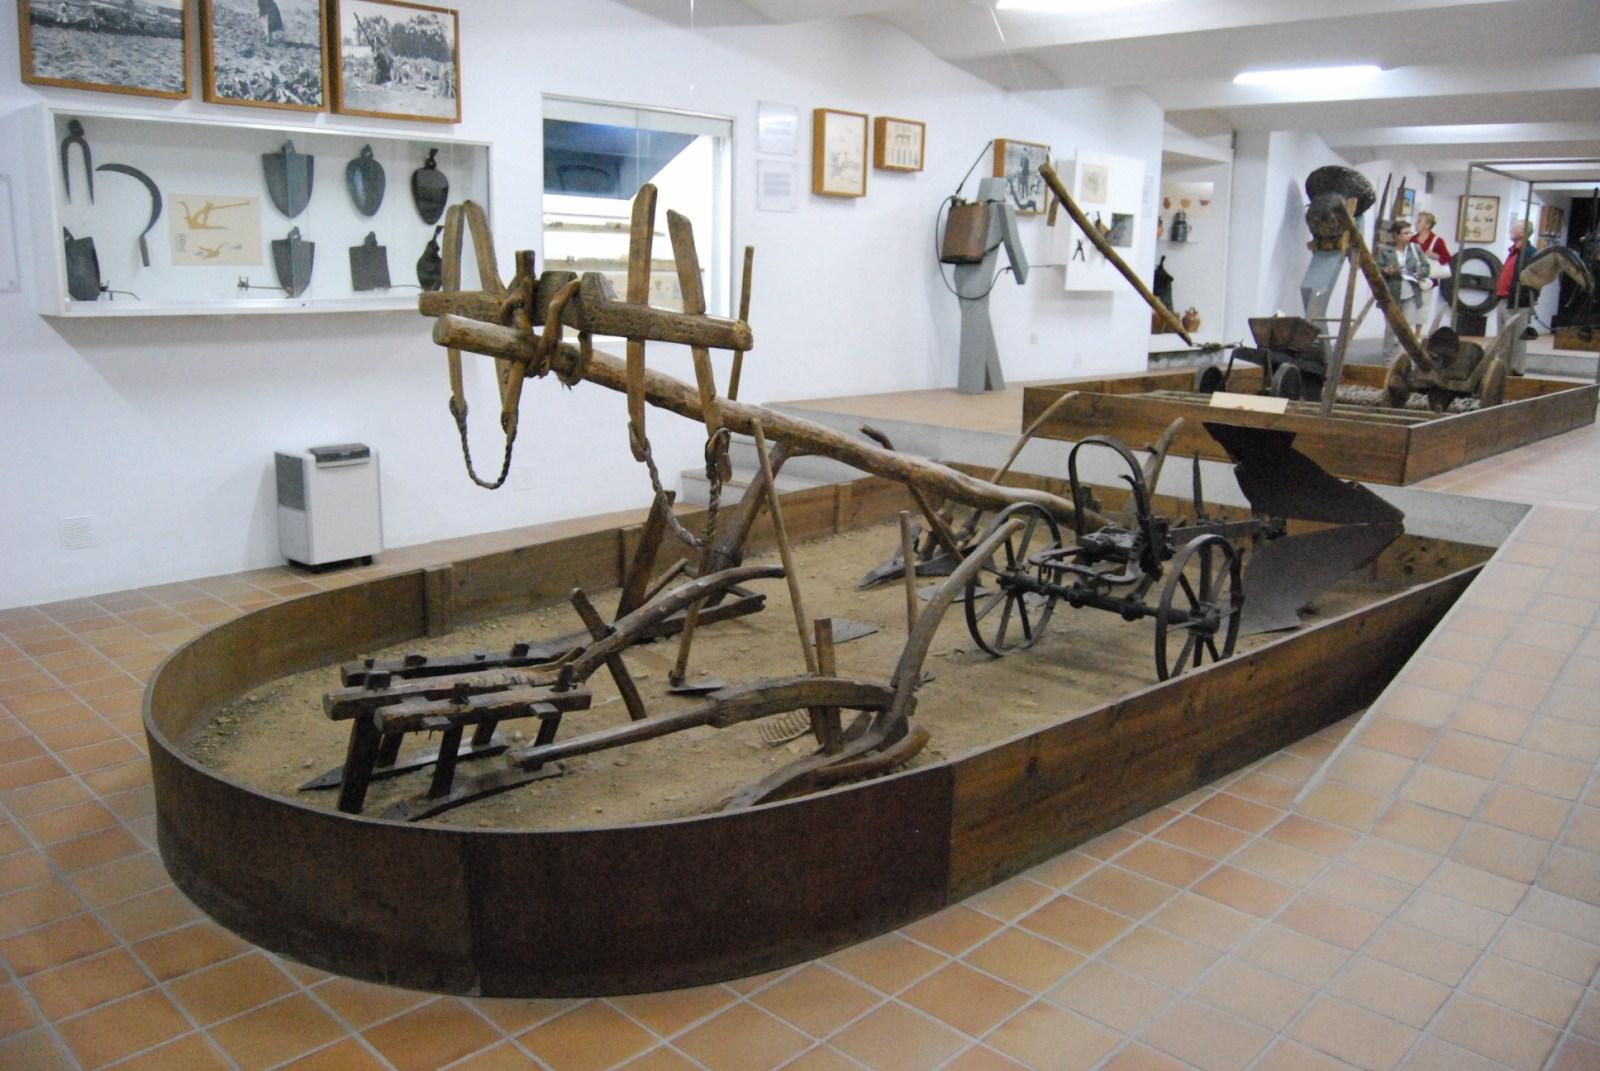 excursiones ramonrosita: Museo do Pobo Galego